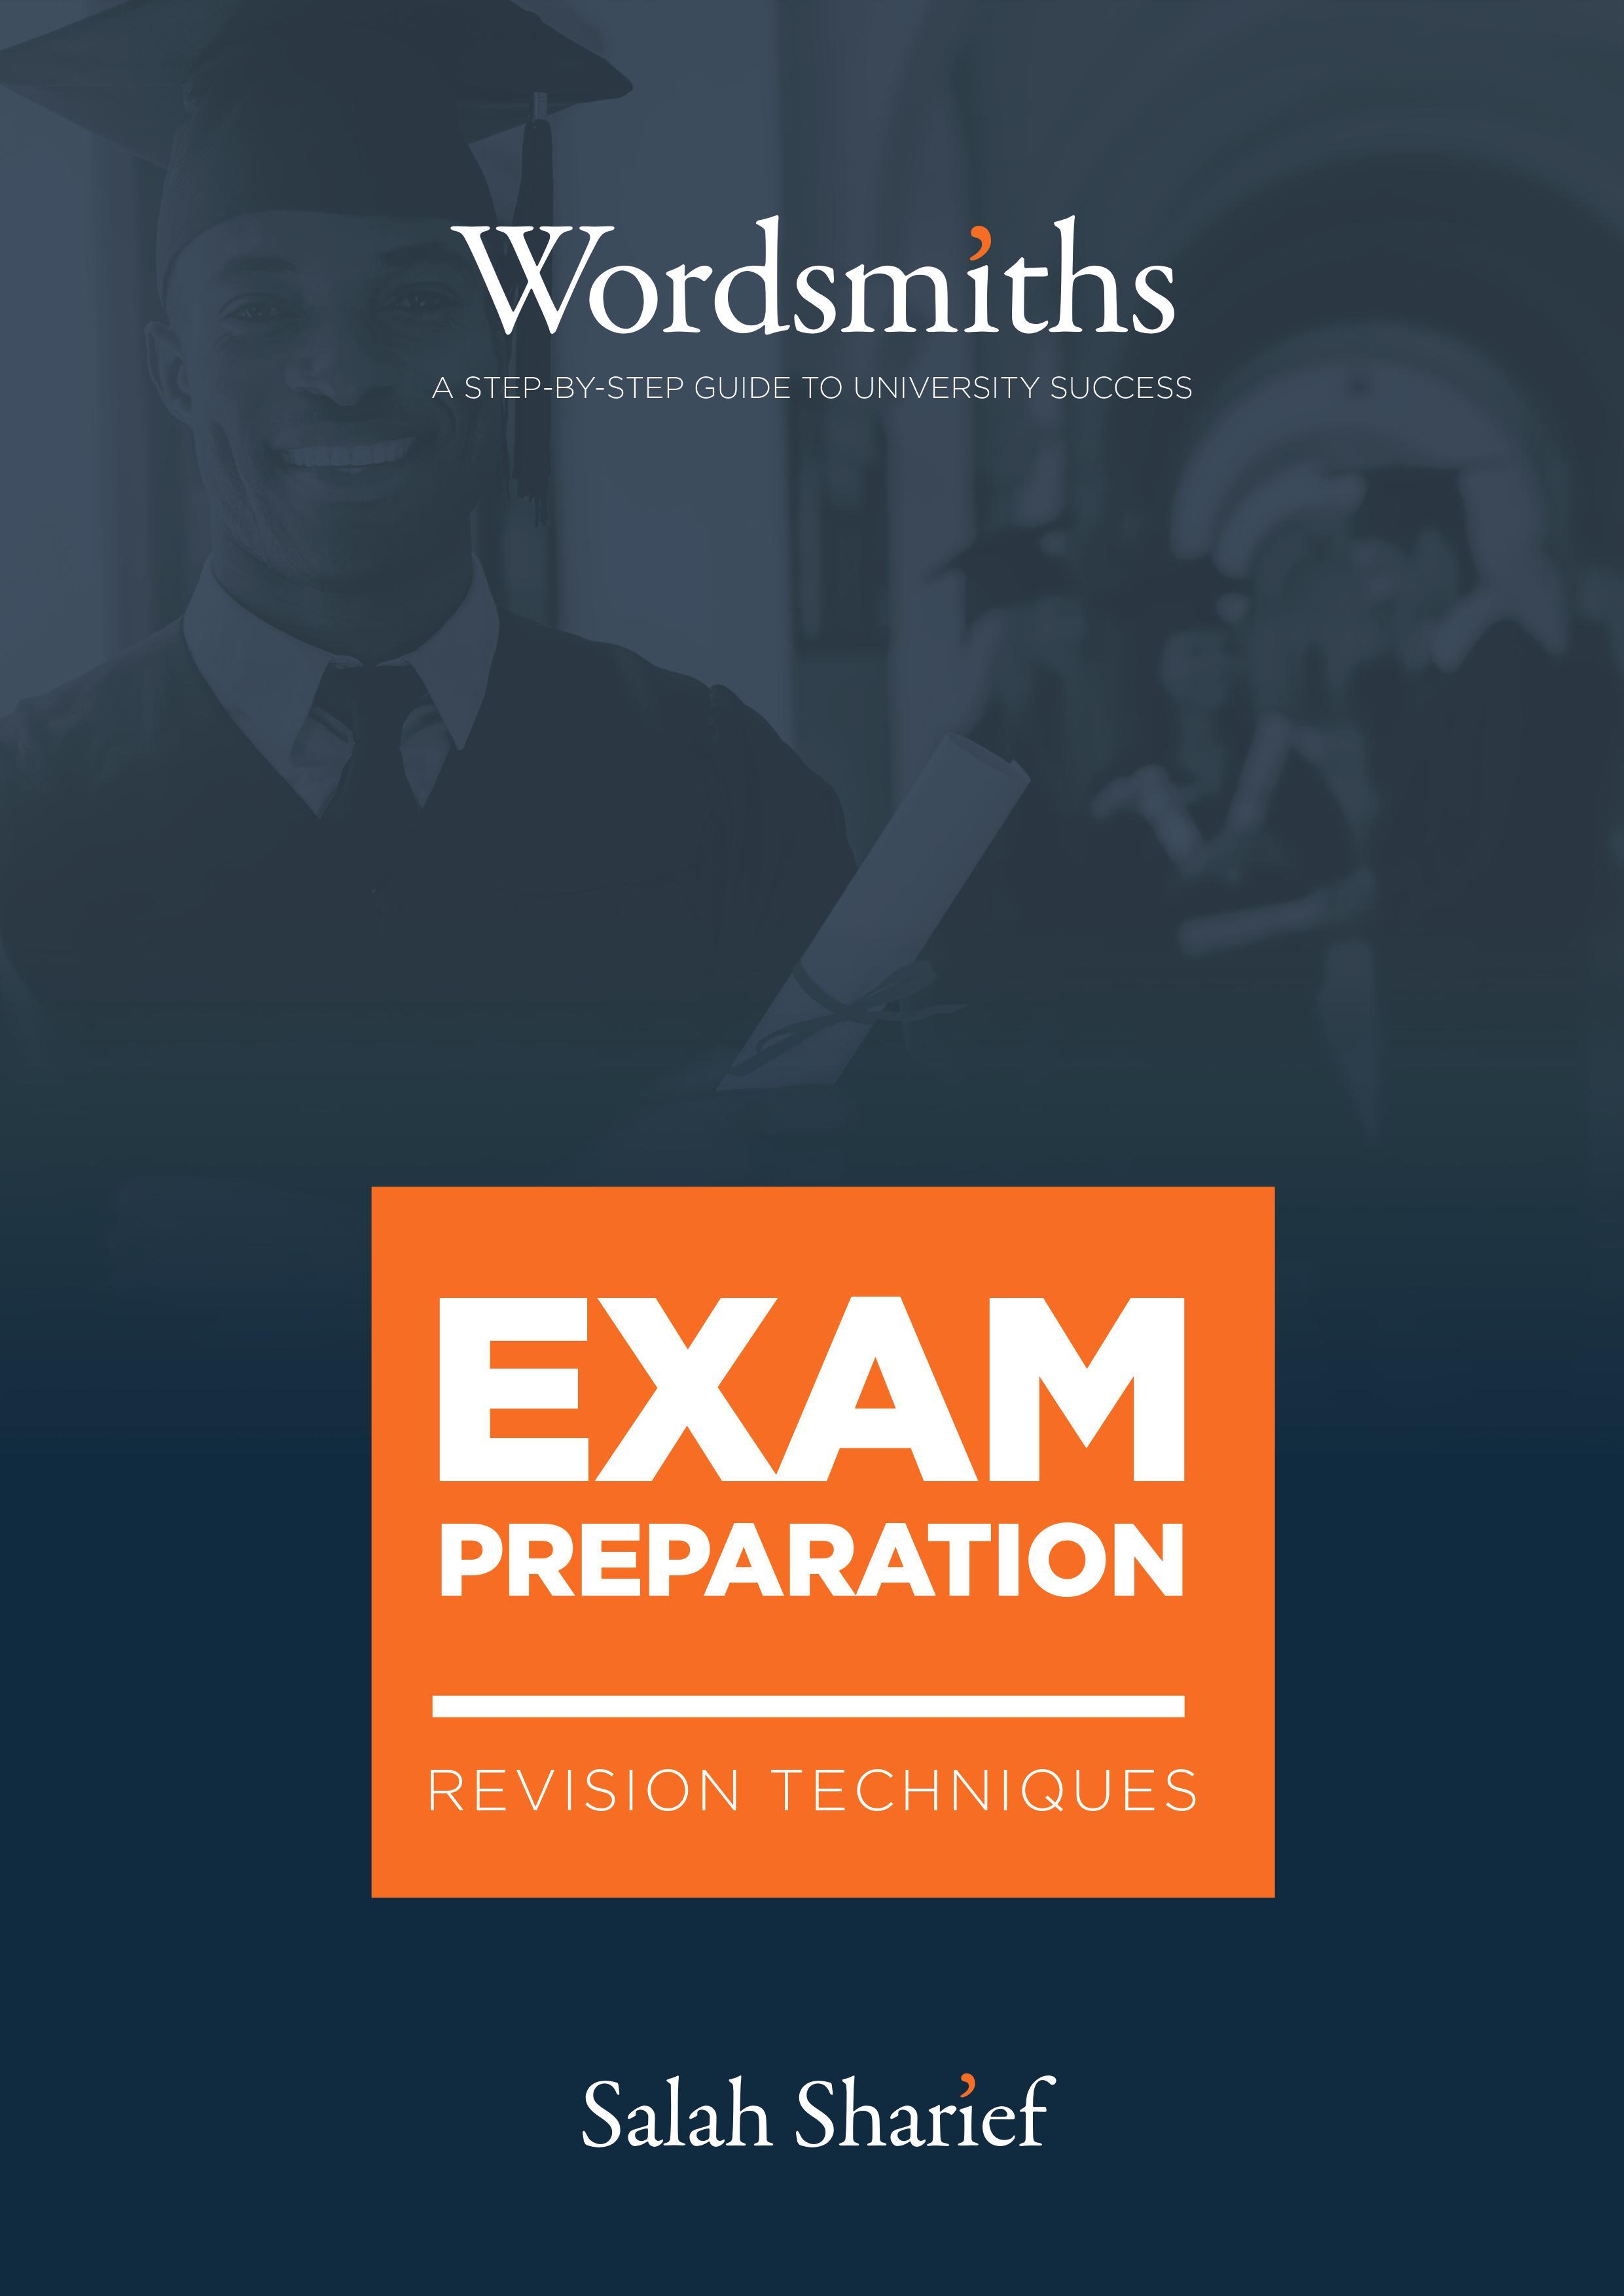 Exam Preparation: Revision Techniques